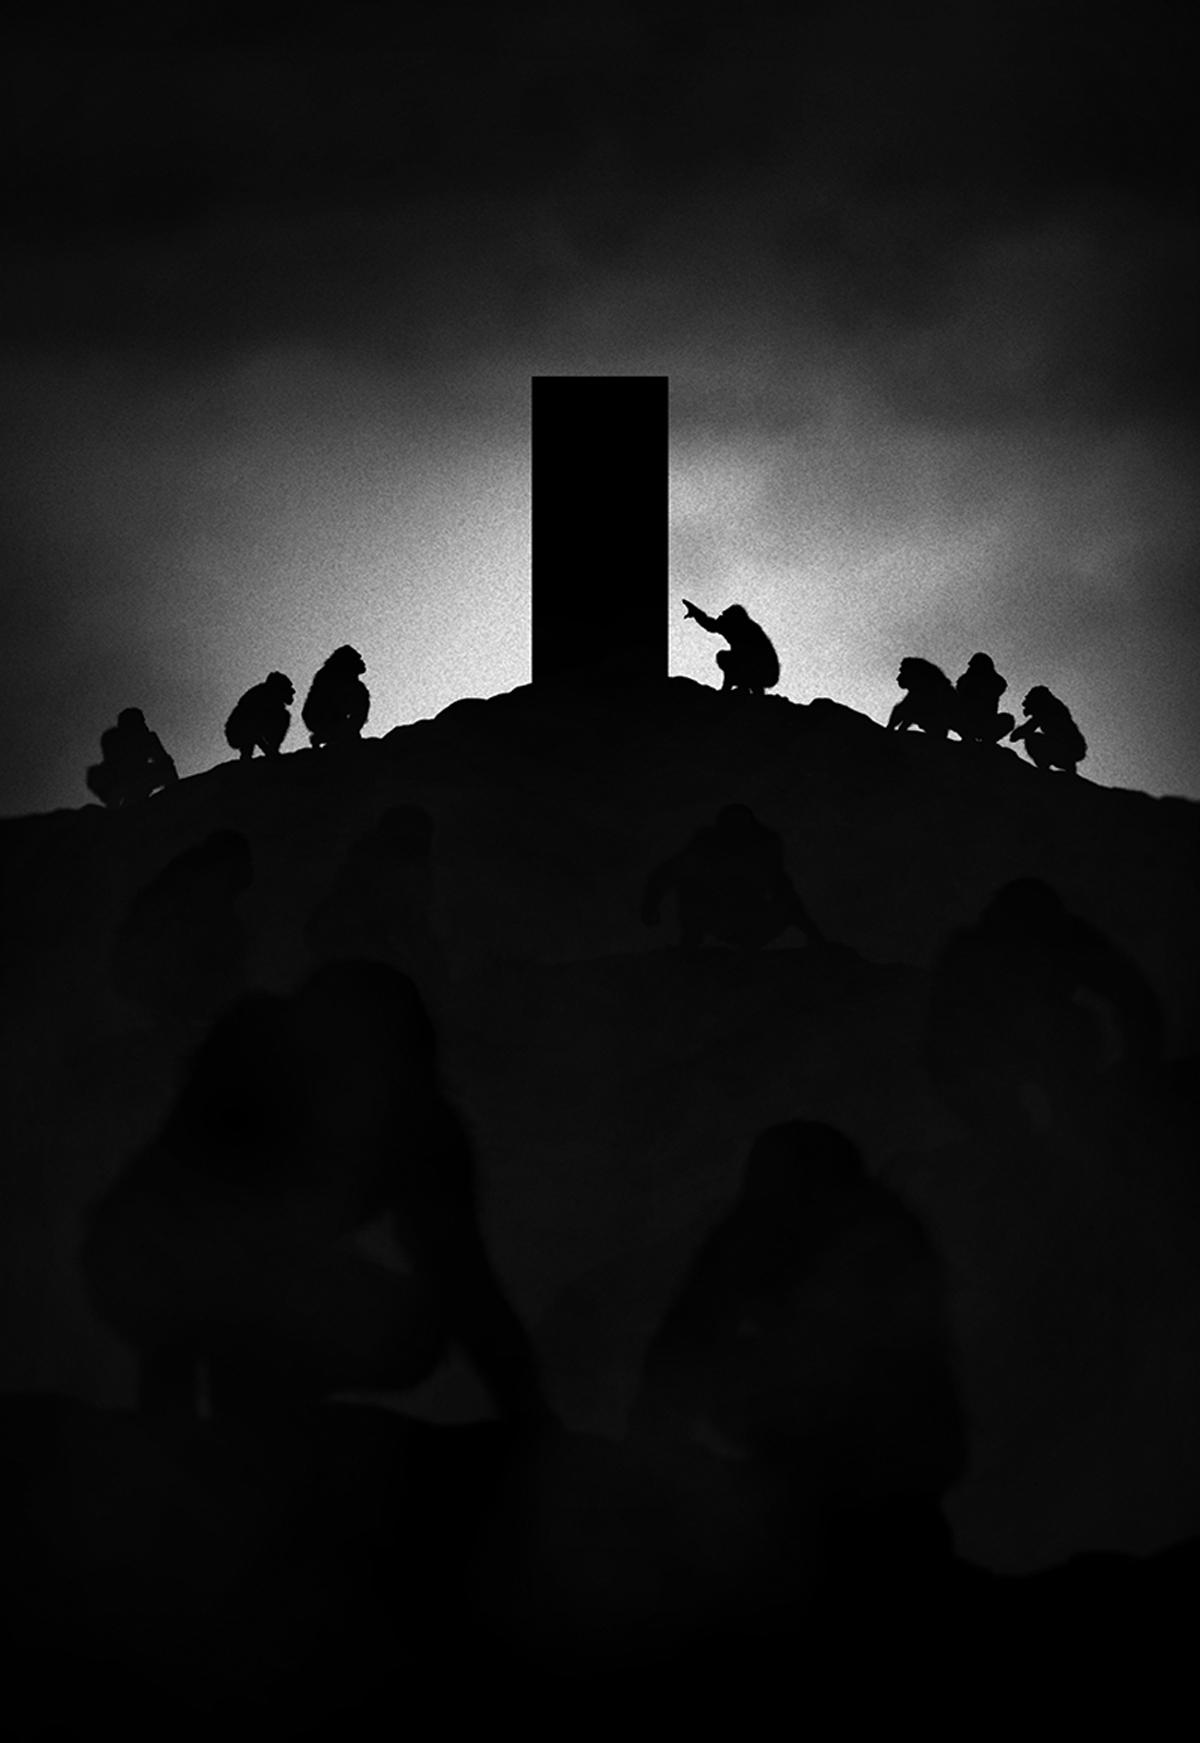 Monolith, Space Odyssey di Stanley Kubrik